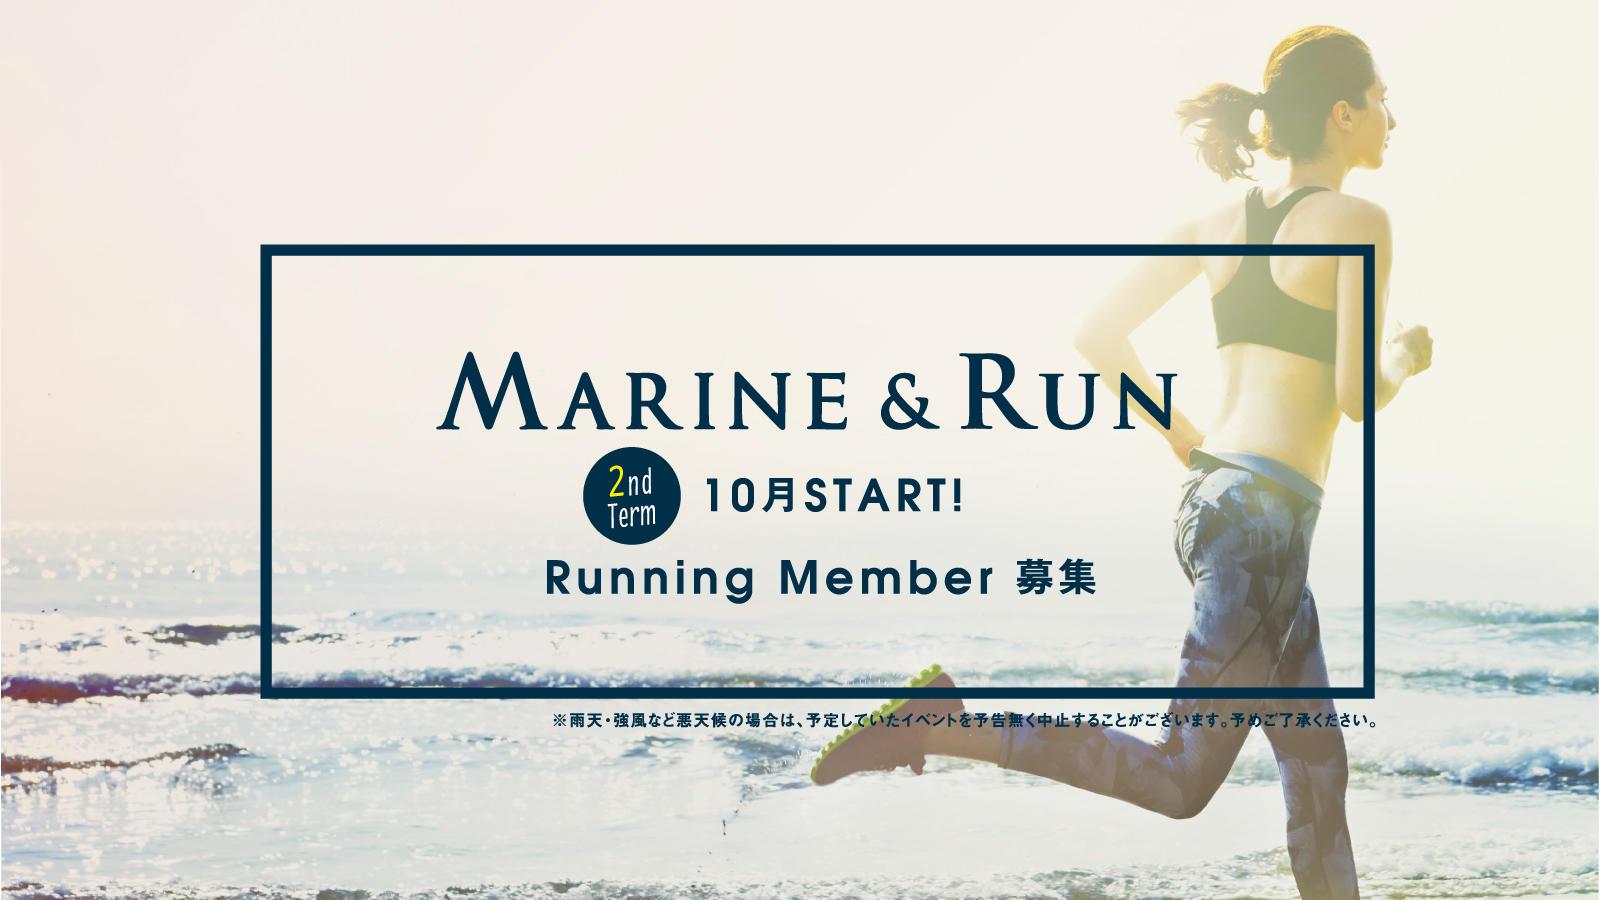 「MARINE&RUN」2nd Term第5回目 2/15開催